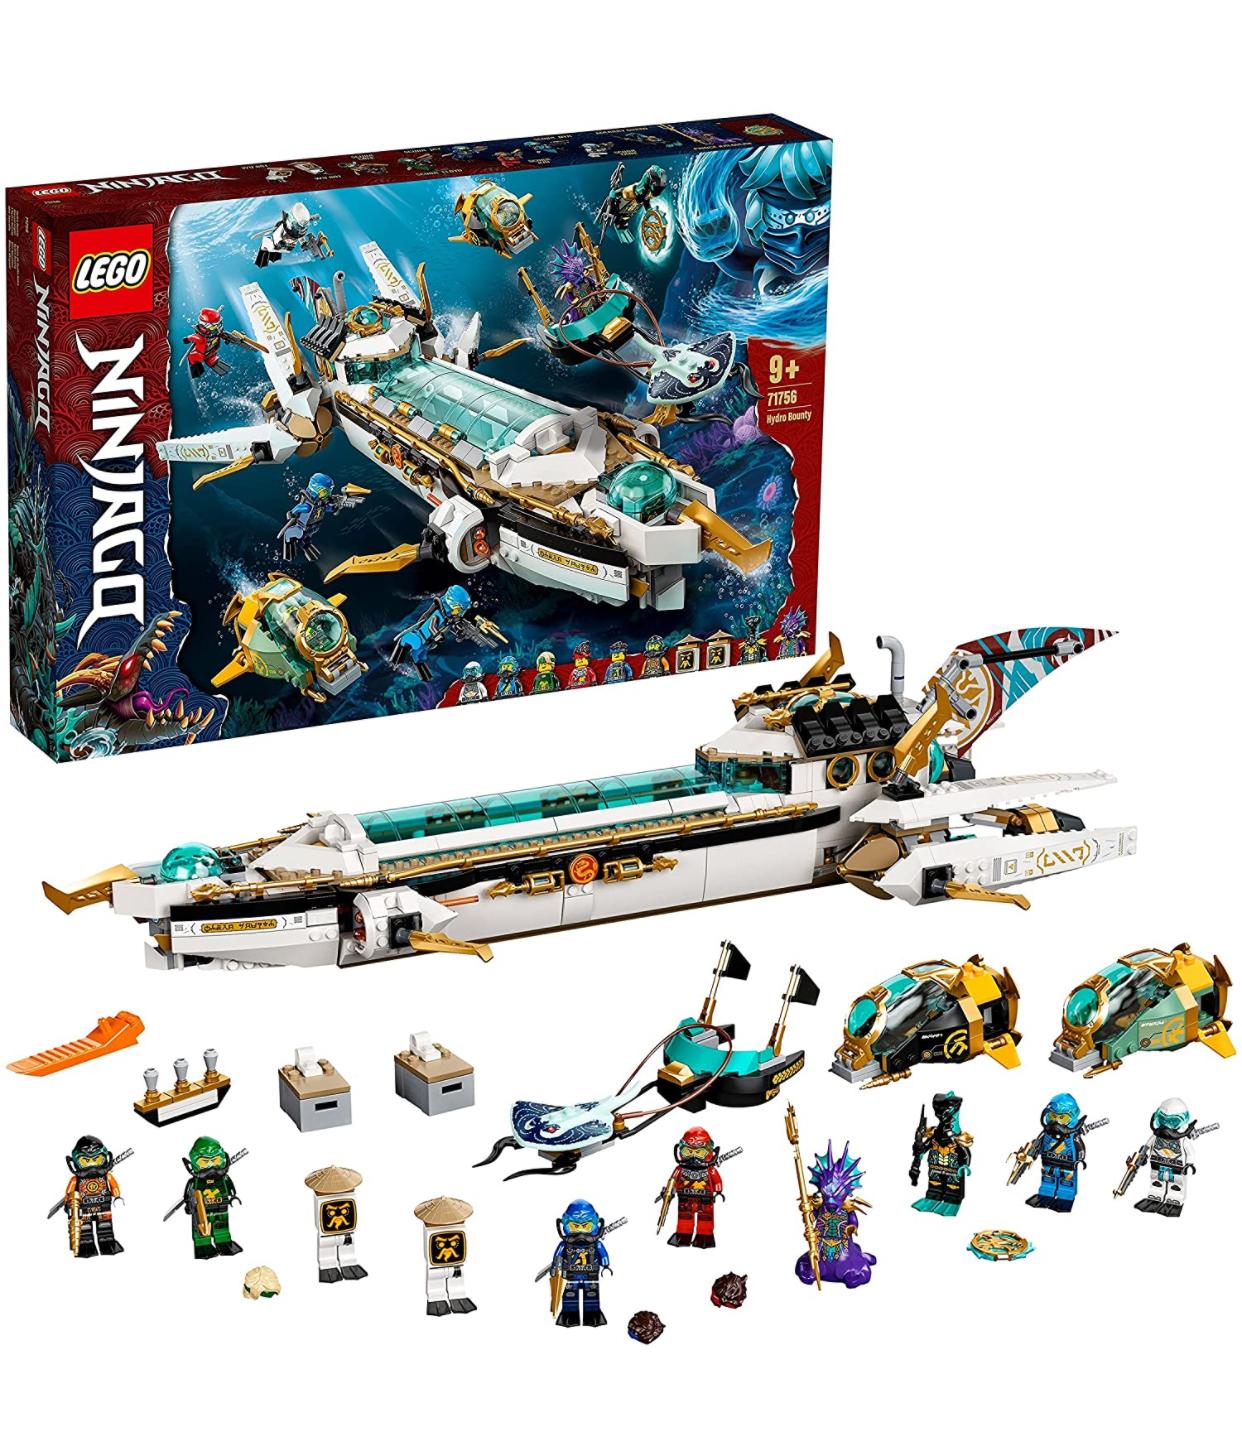 LEGO Ninjago 71756 Hydro Bounty Set - £87.99 /LEGO DUPLO 10939 T. rex and Triceratops Dinosaur Breakout - £22.39 with code @ Zavvi